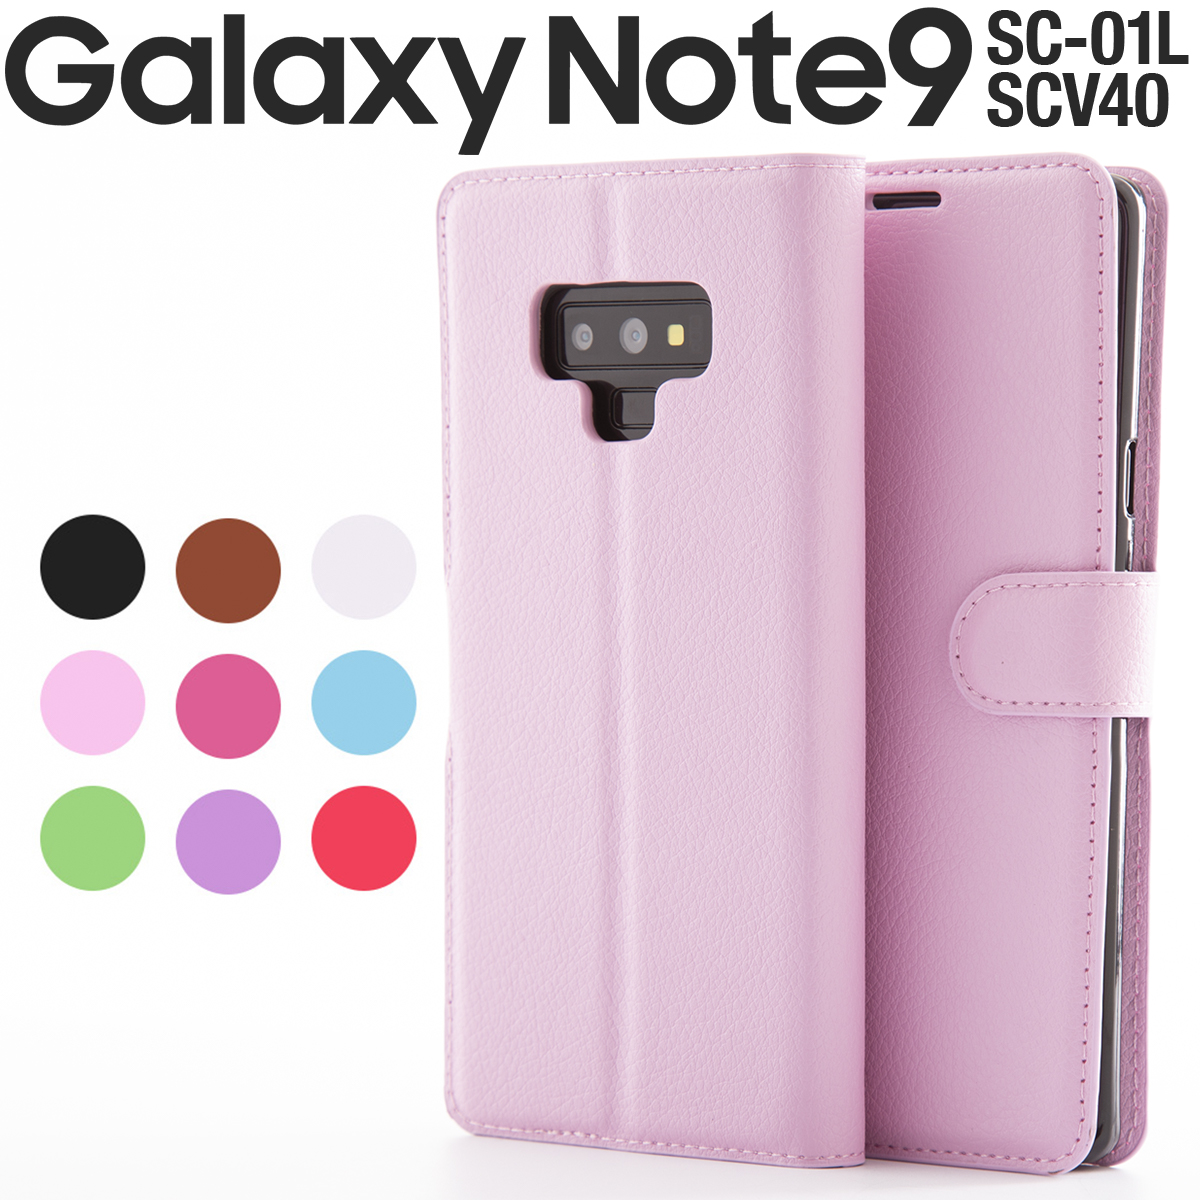 Galaxy Note9 SC-01L SCV40 レザー手帳型ケース